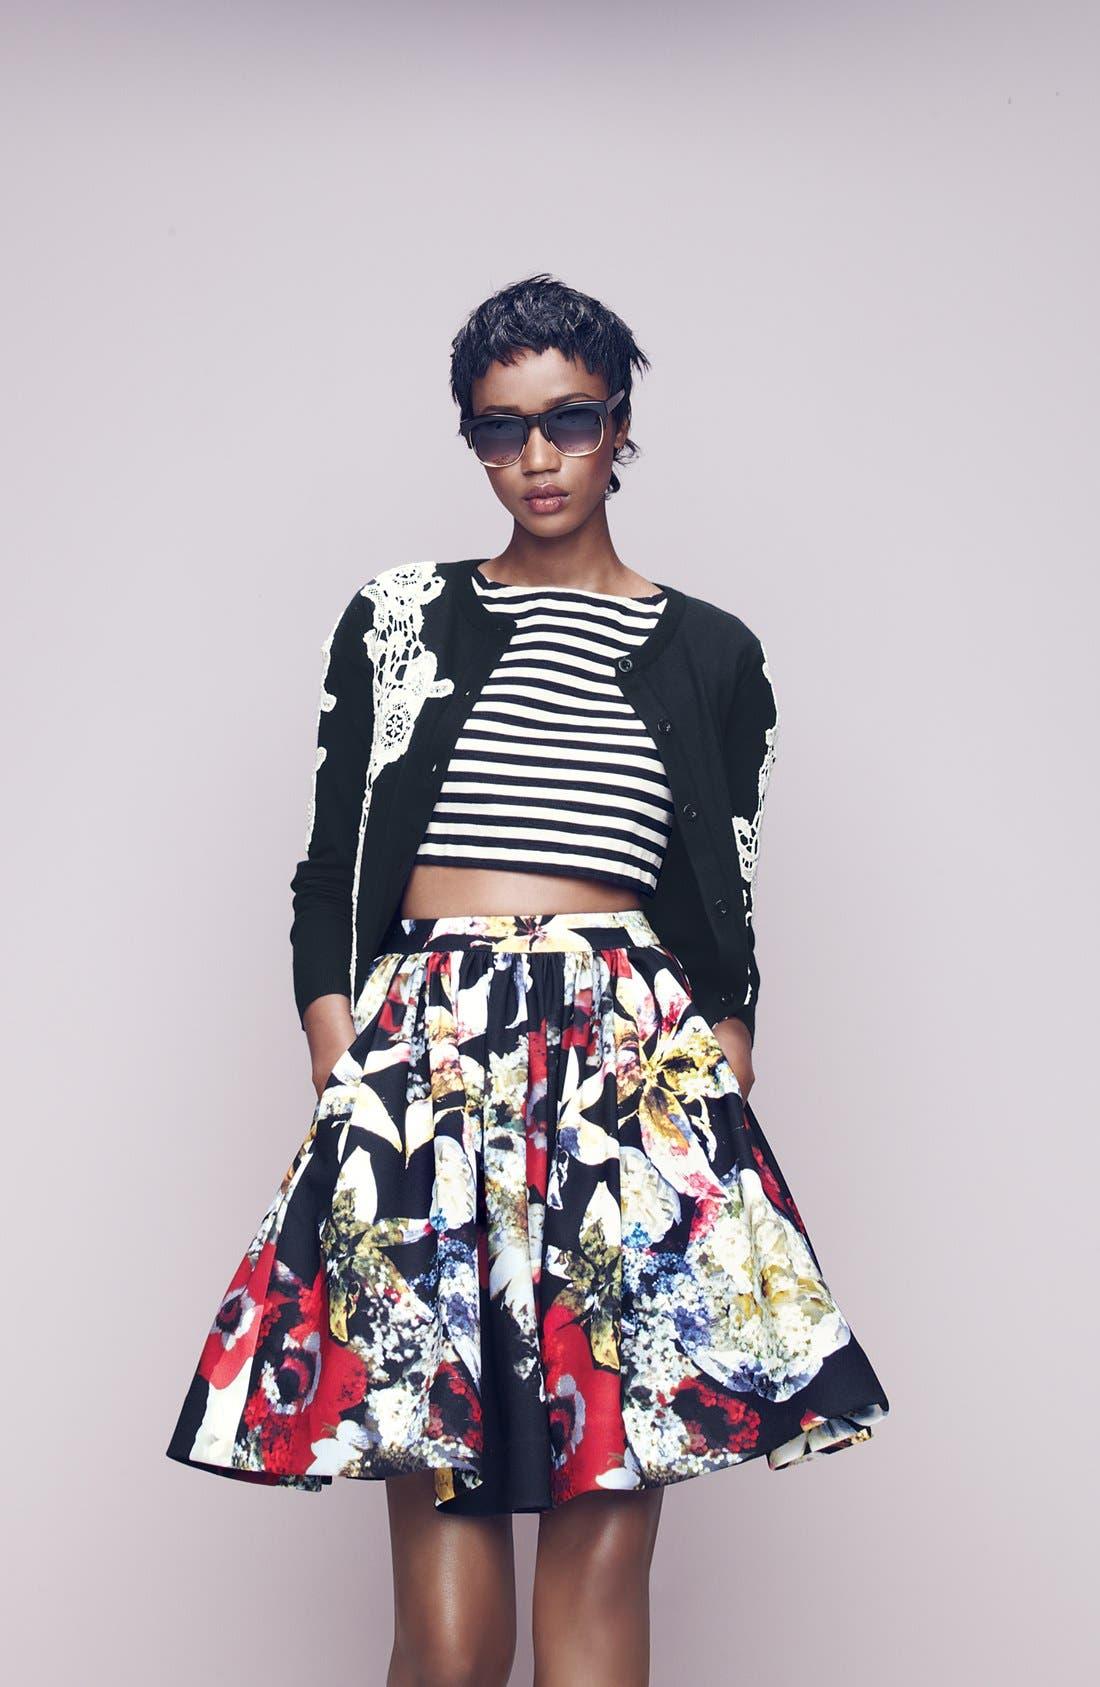 Alternate Image 1 Selected - Alice + Olivia Cardigan, Crop Top & Skirt